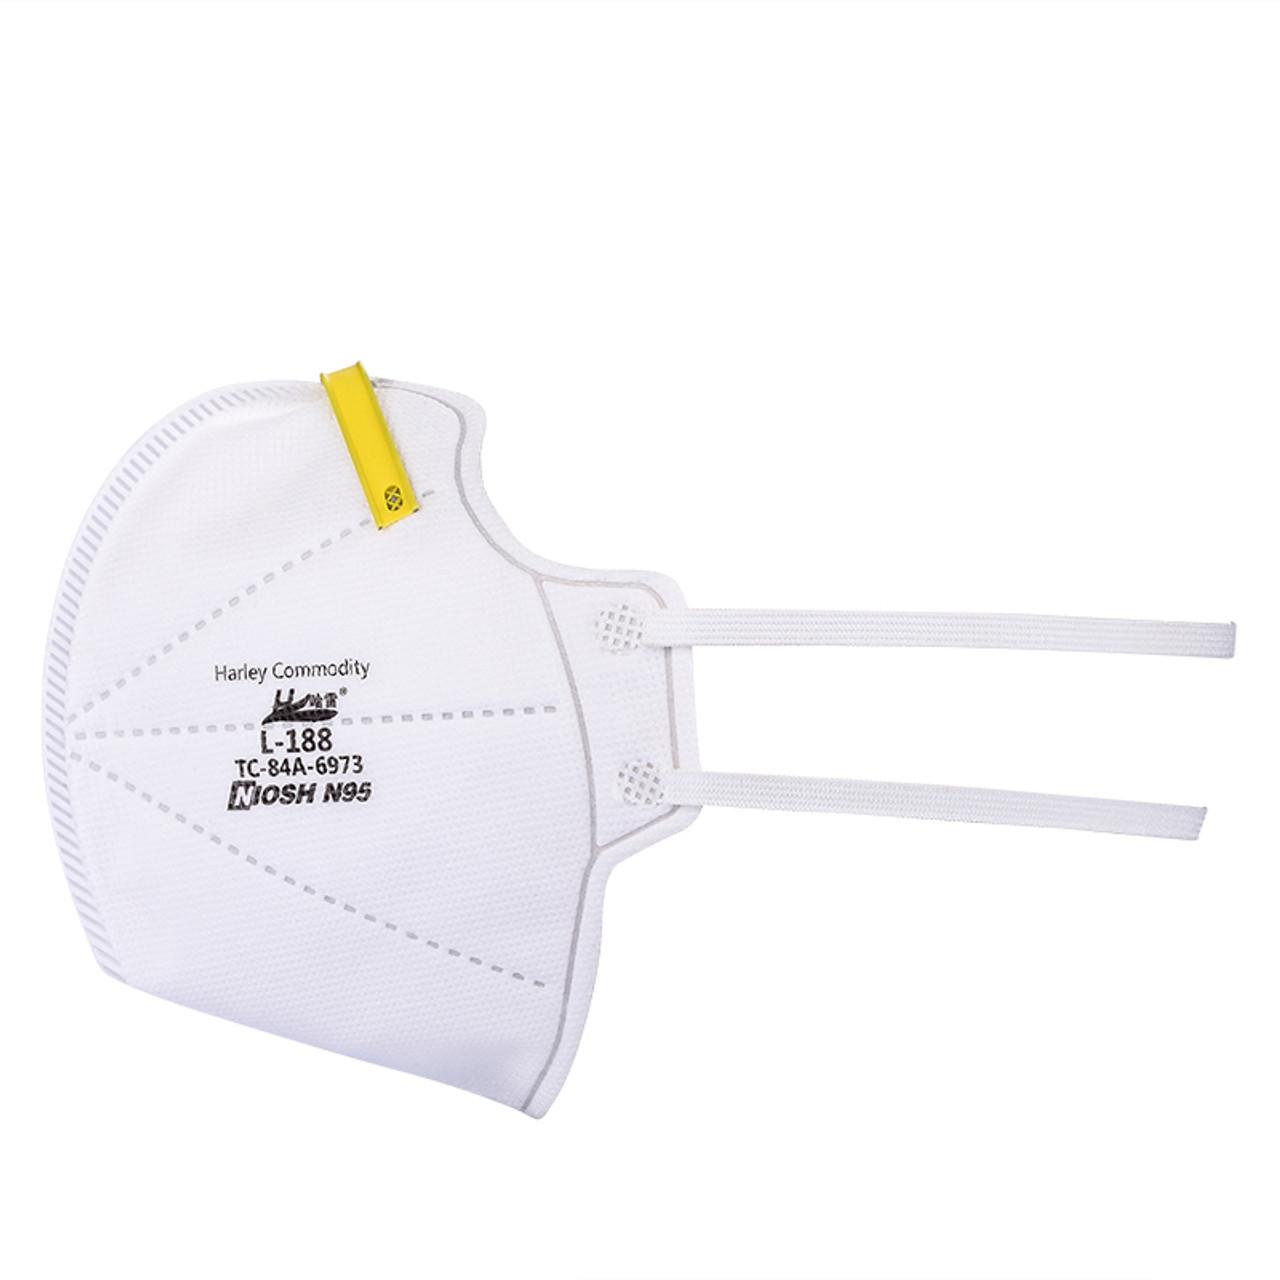 Harley Commodity N95 Respirator Face Mask   L-188   NIOSH Approved   20 masks per box